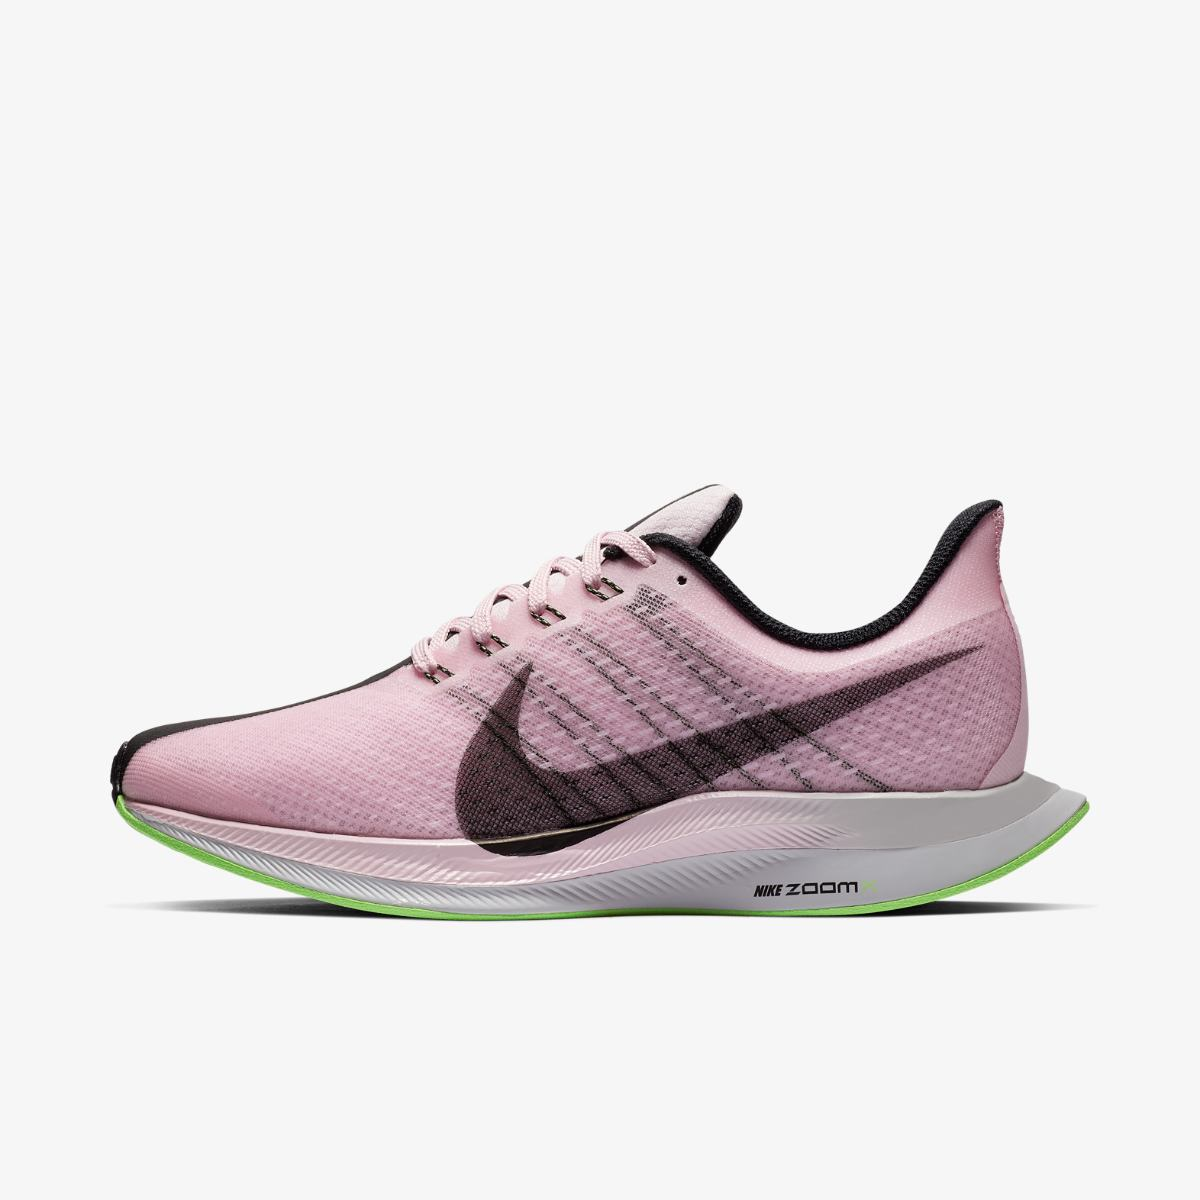 babc8cda Кроссовки Nike W ZOOM PEGASUS 35 TURBO купить | deltasport.ua